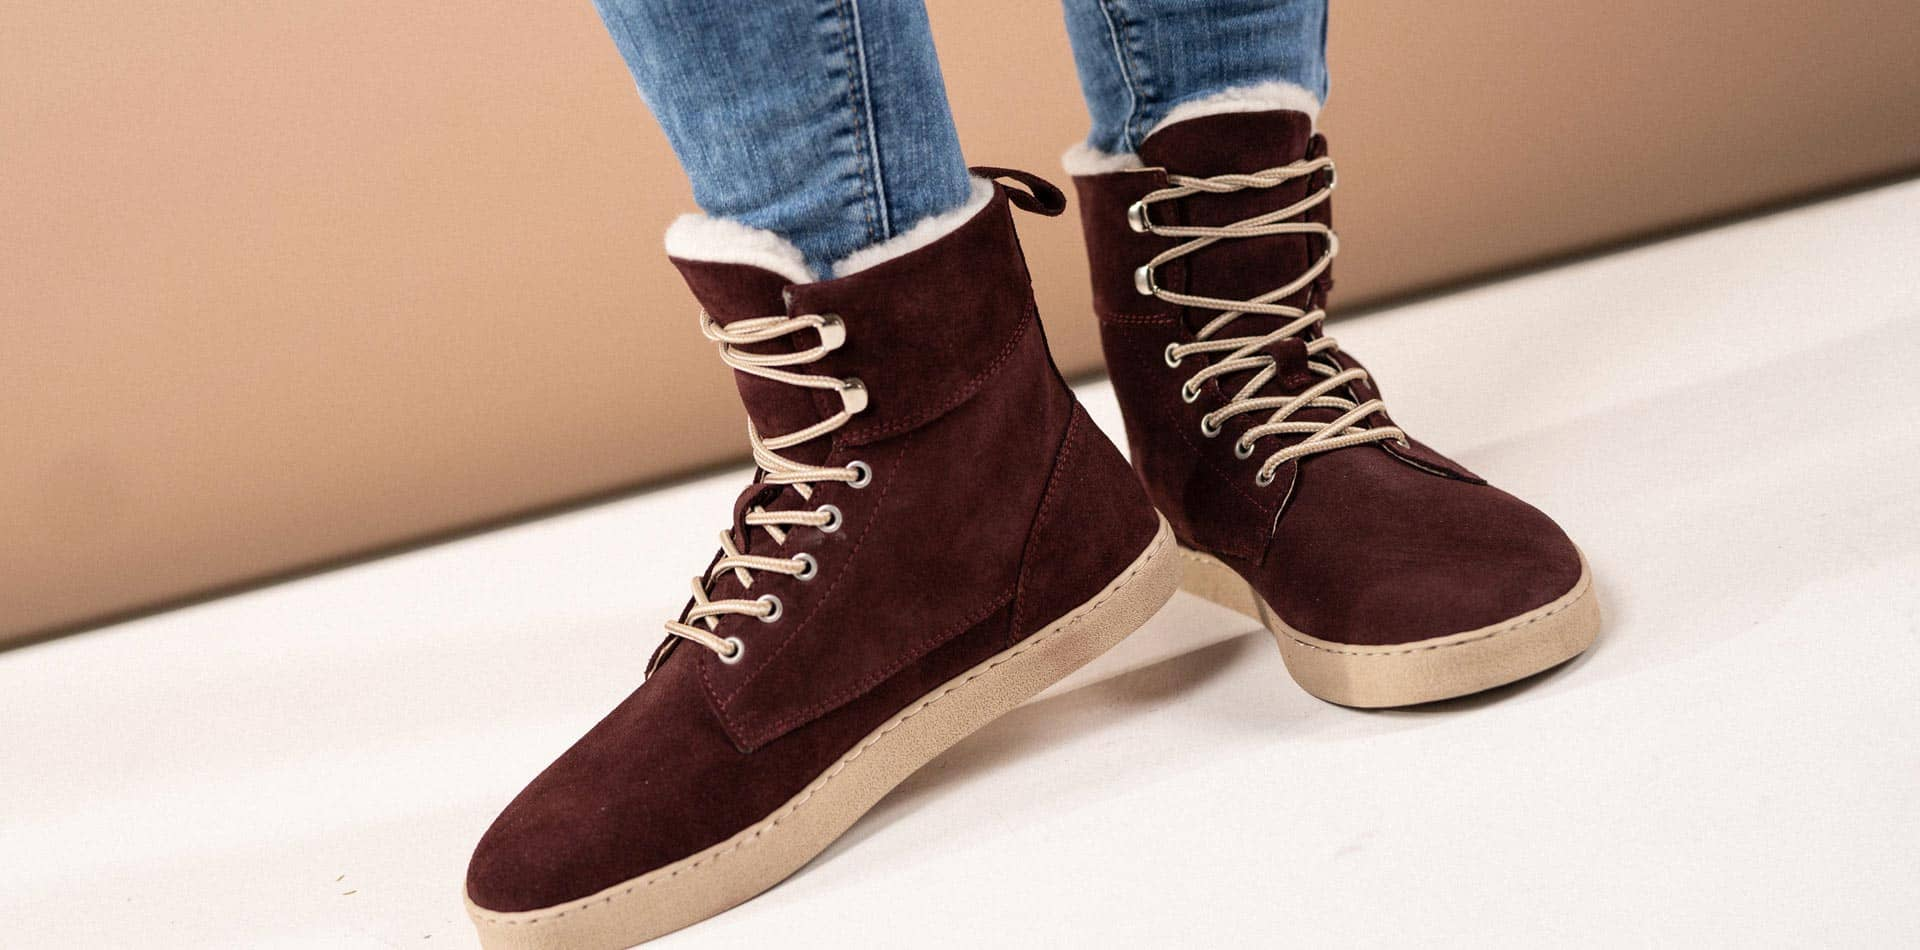 Groundies Urban Barefootwear